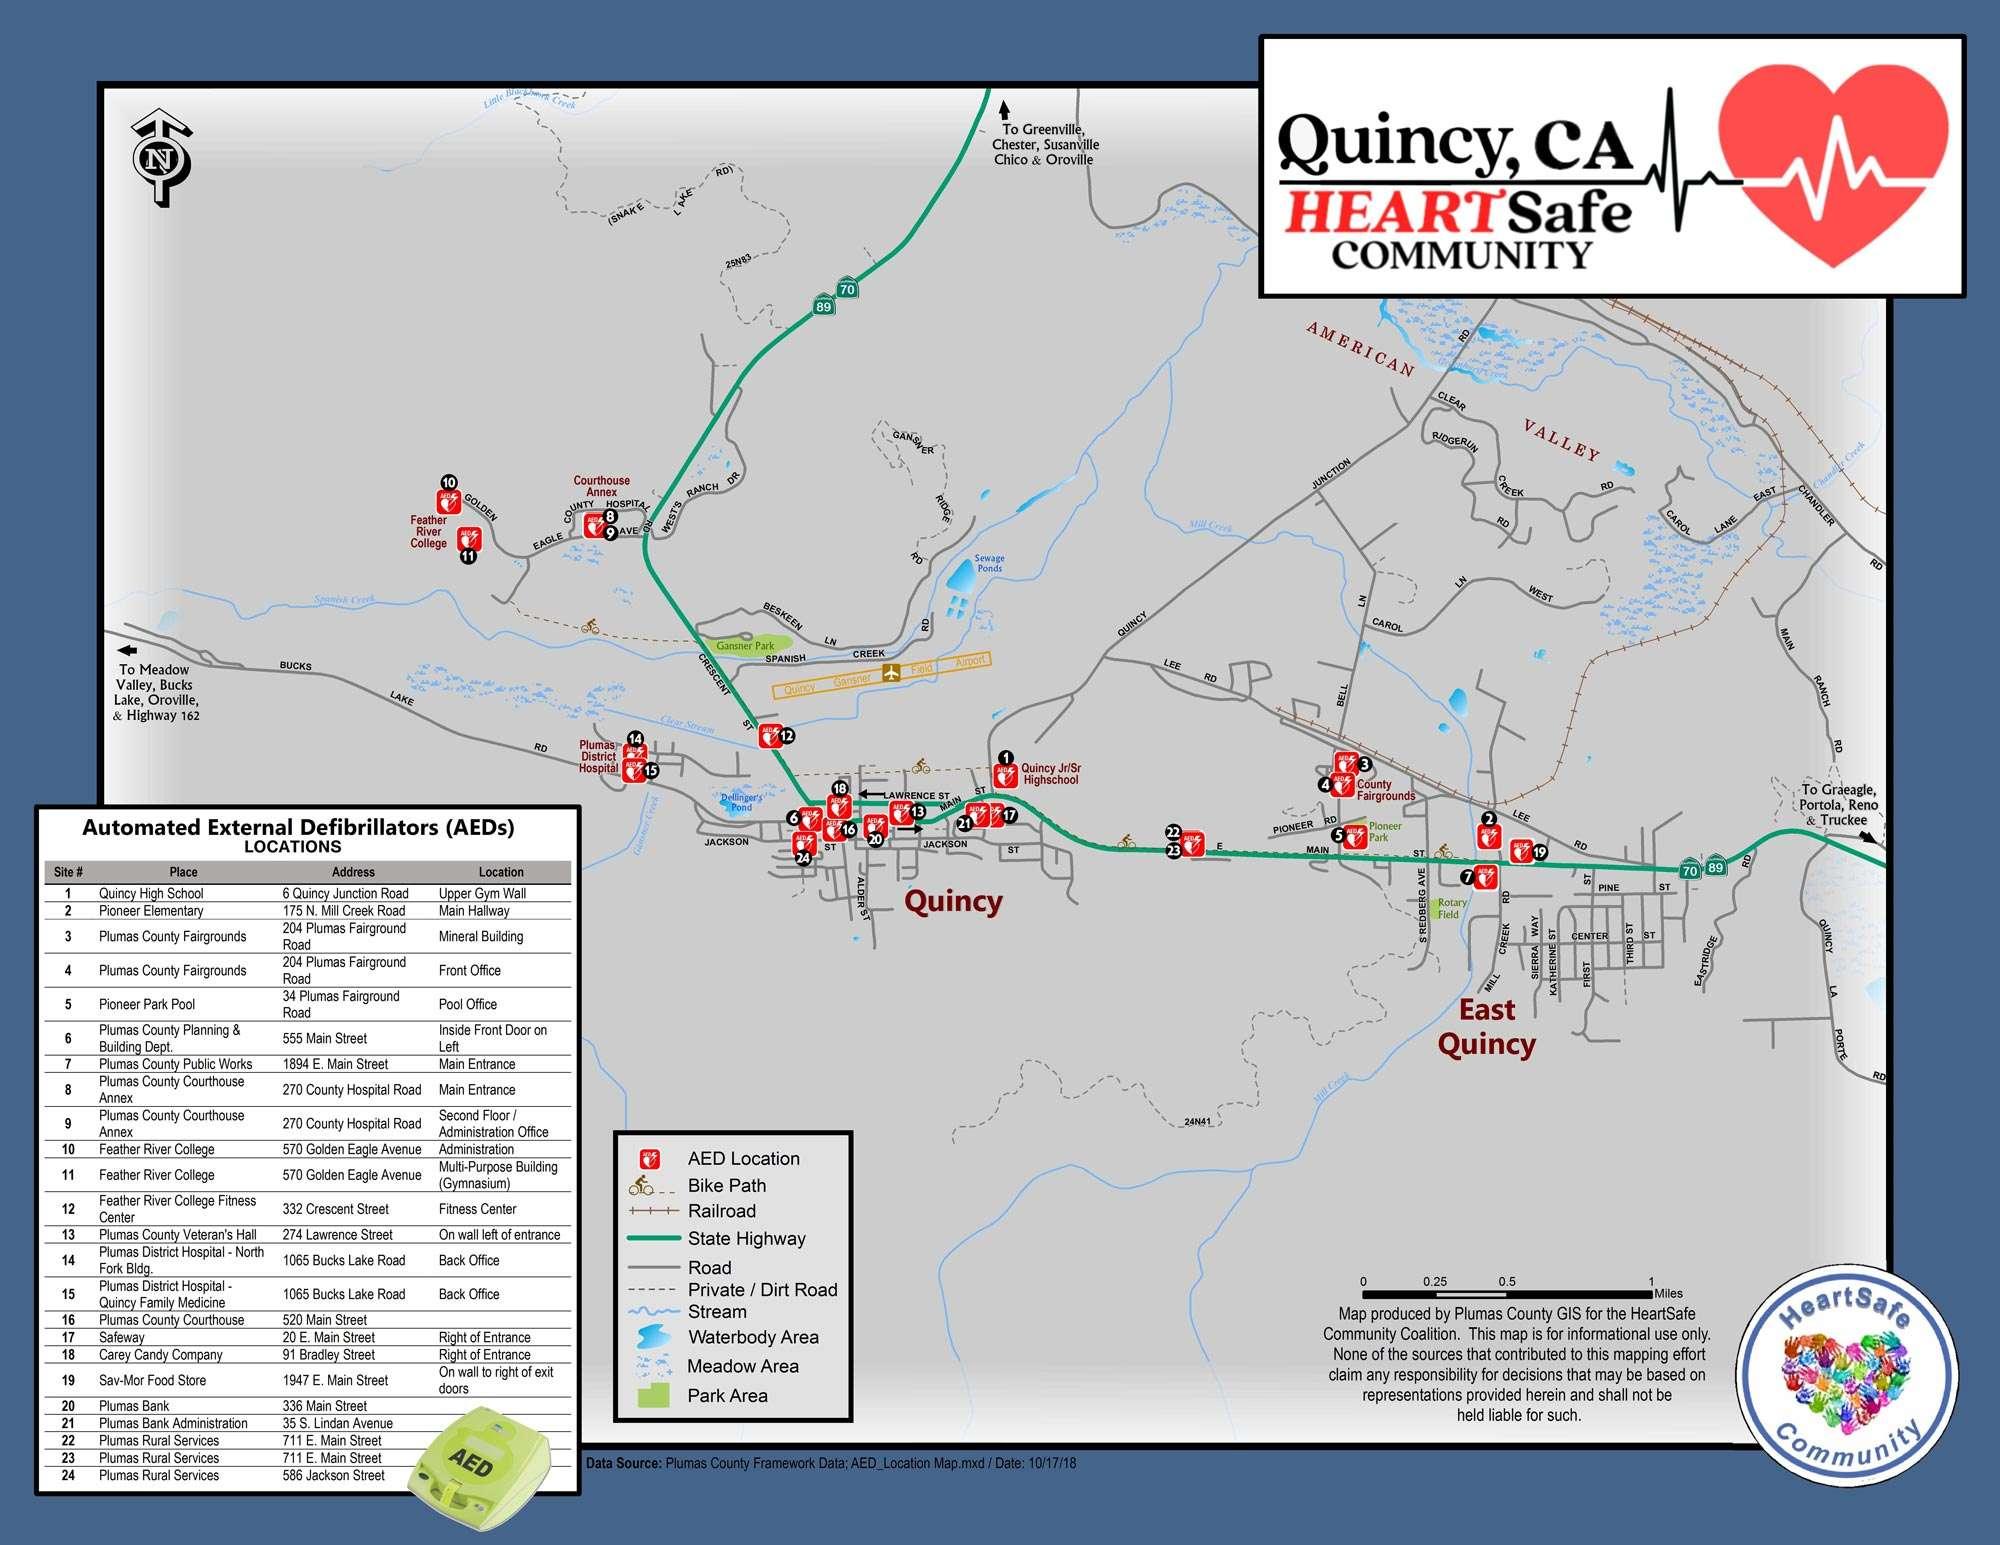 Safeway is latest location to house lifesaving device - Plumas News